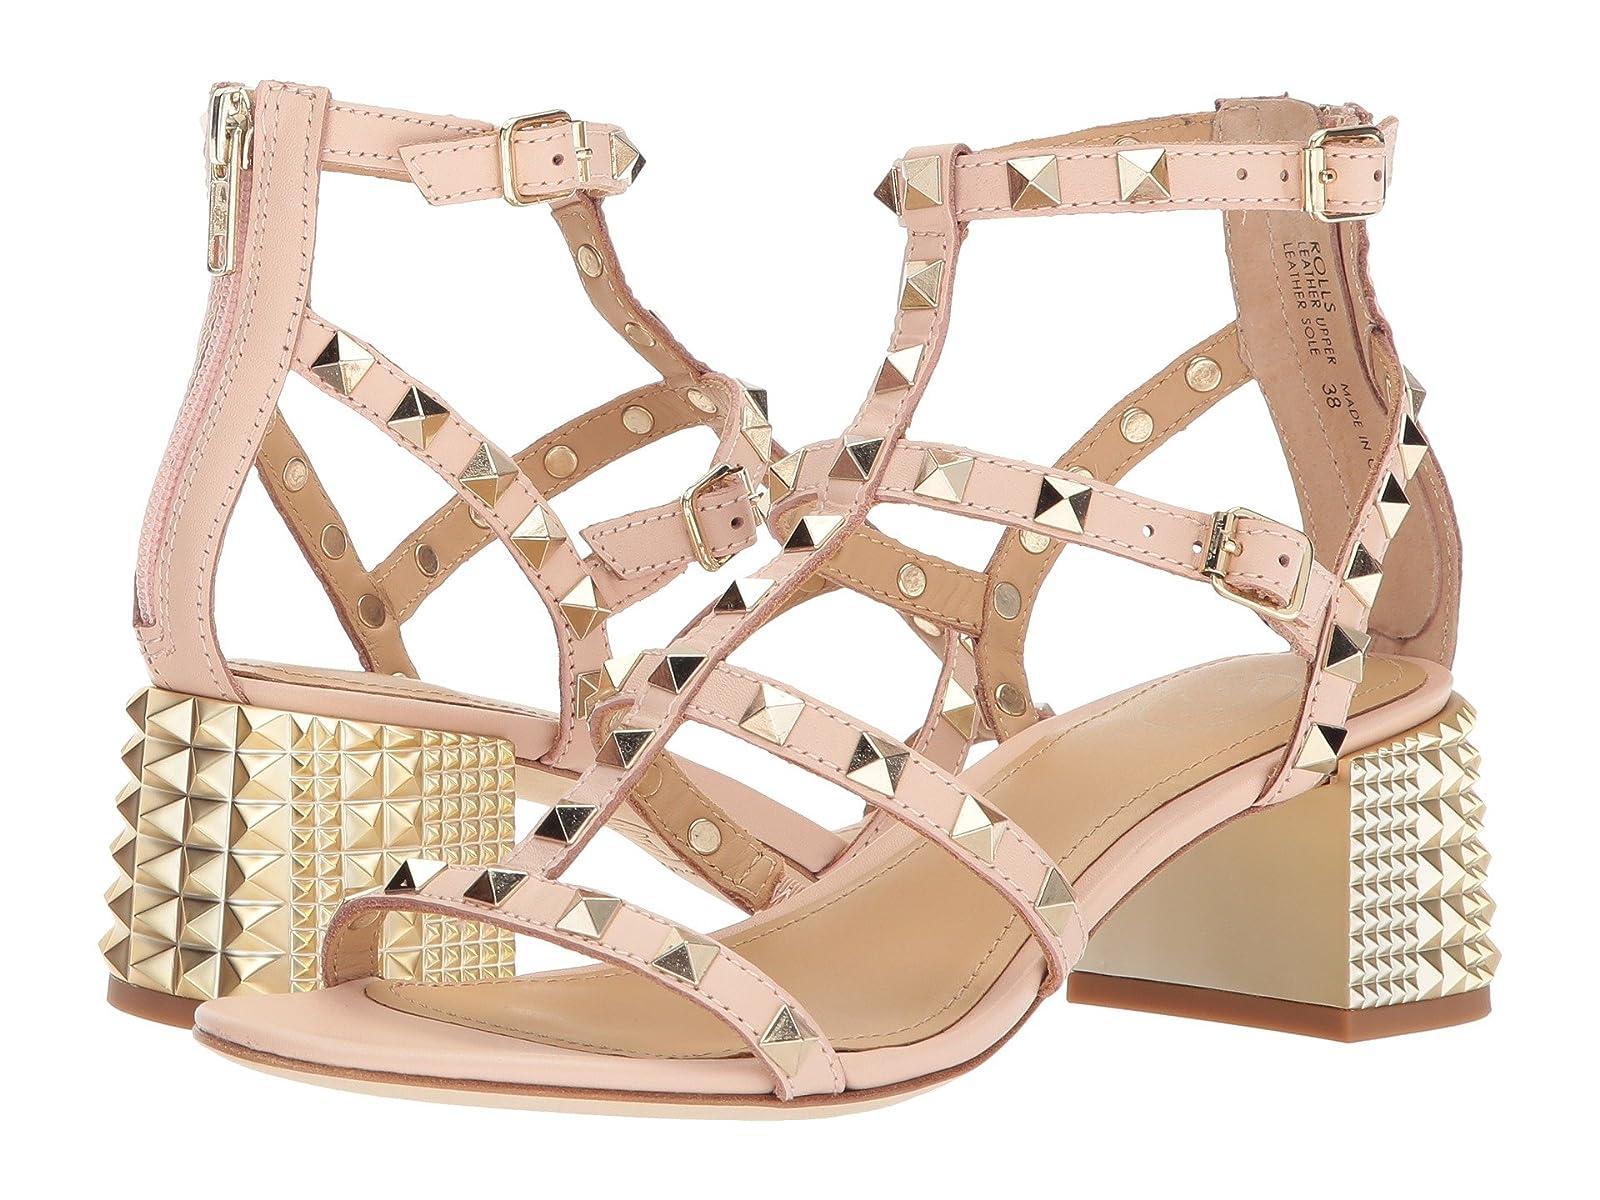 ASH RollsCheap and distinctive eye-catching shoes